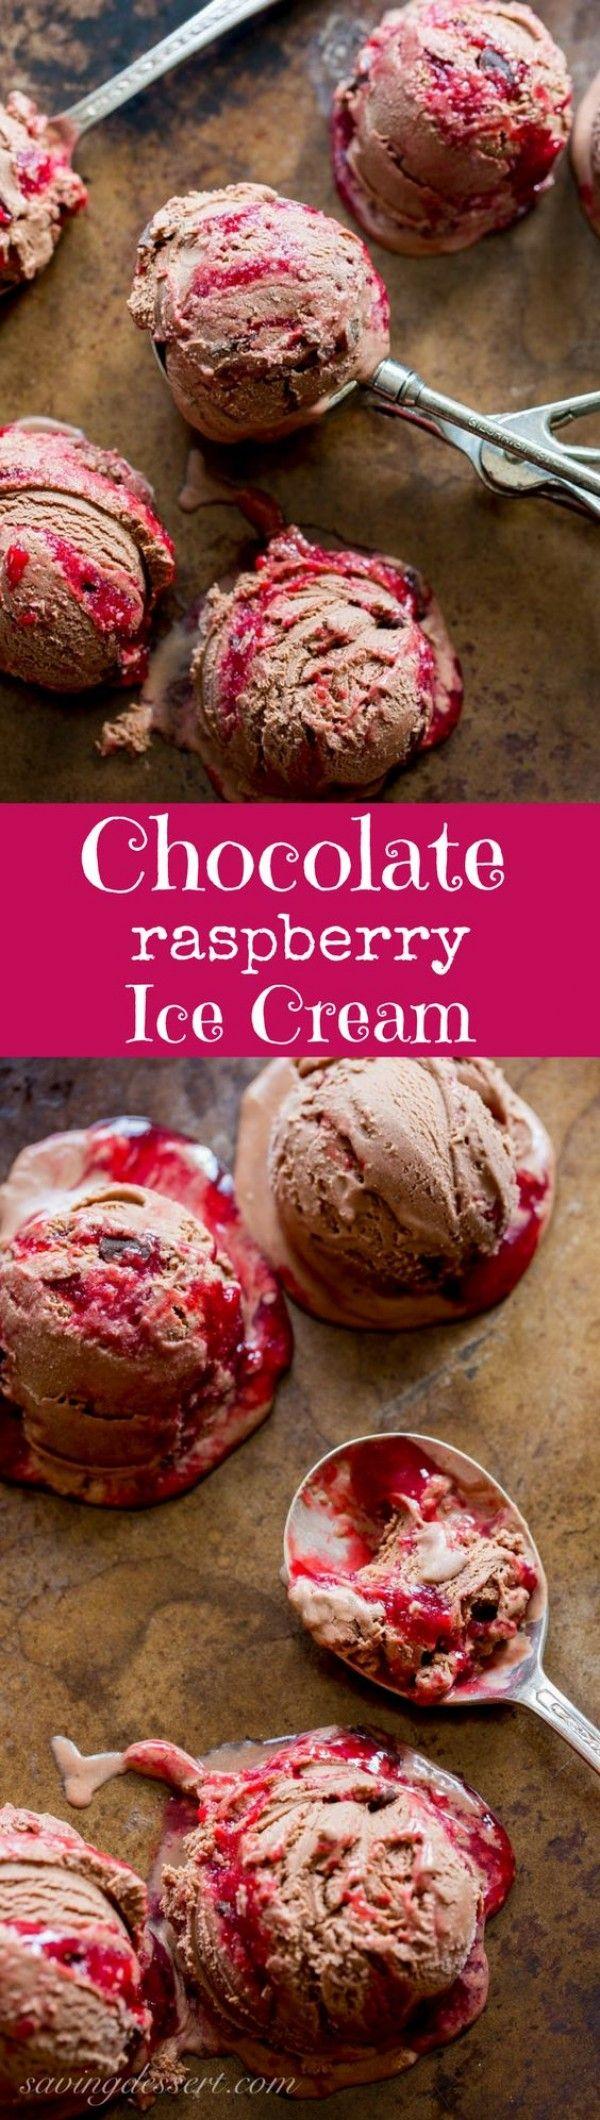 Get the recipe Chocolate Raspberry Ice Cream @recipes_to_go